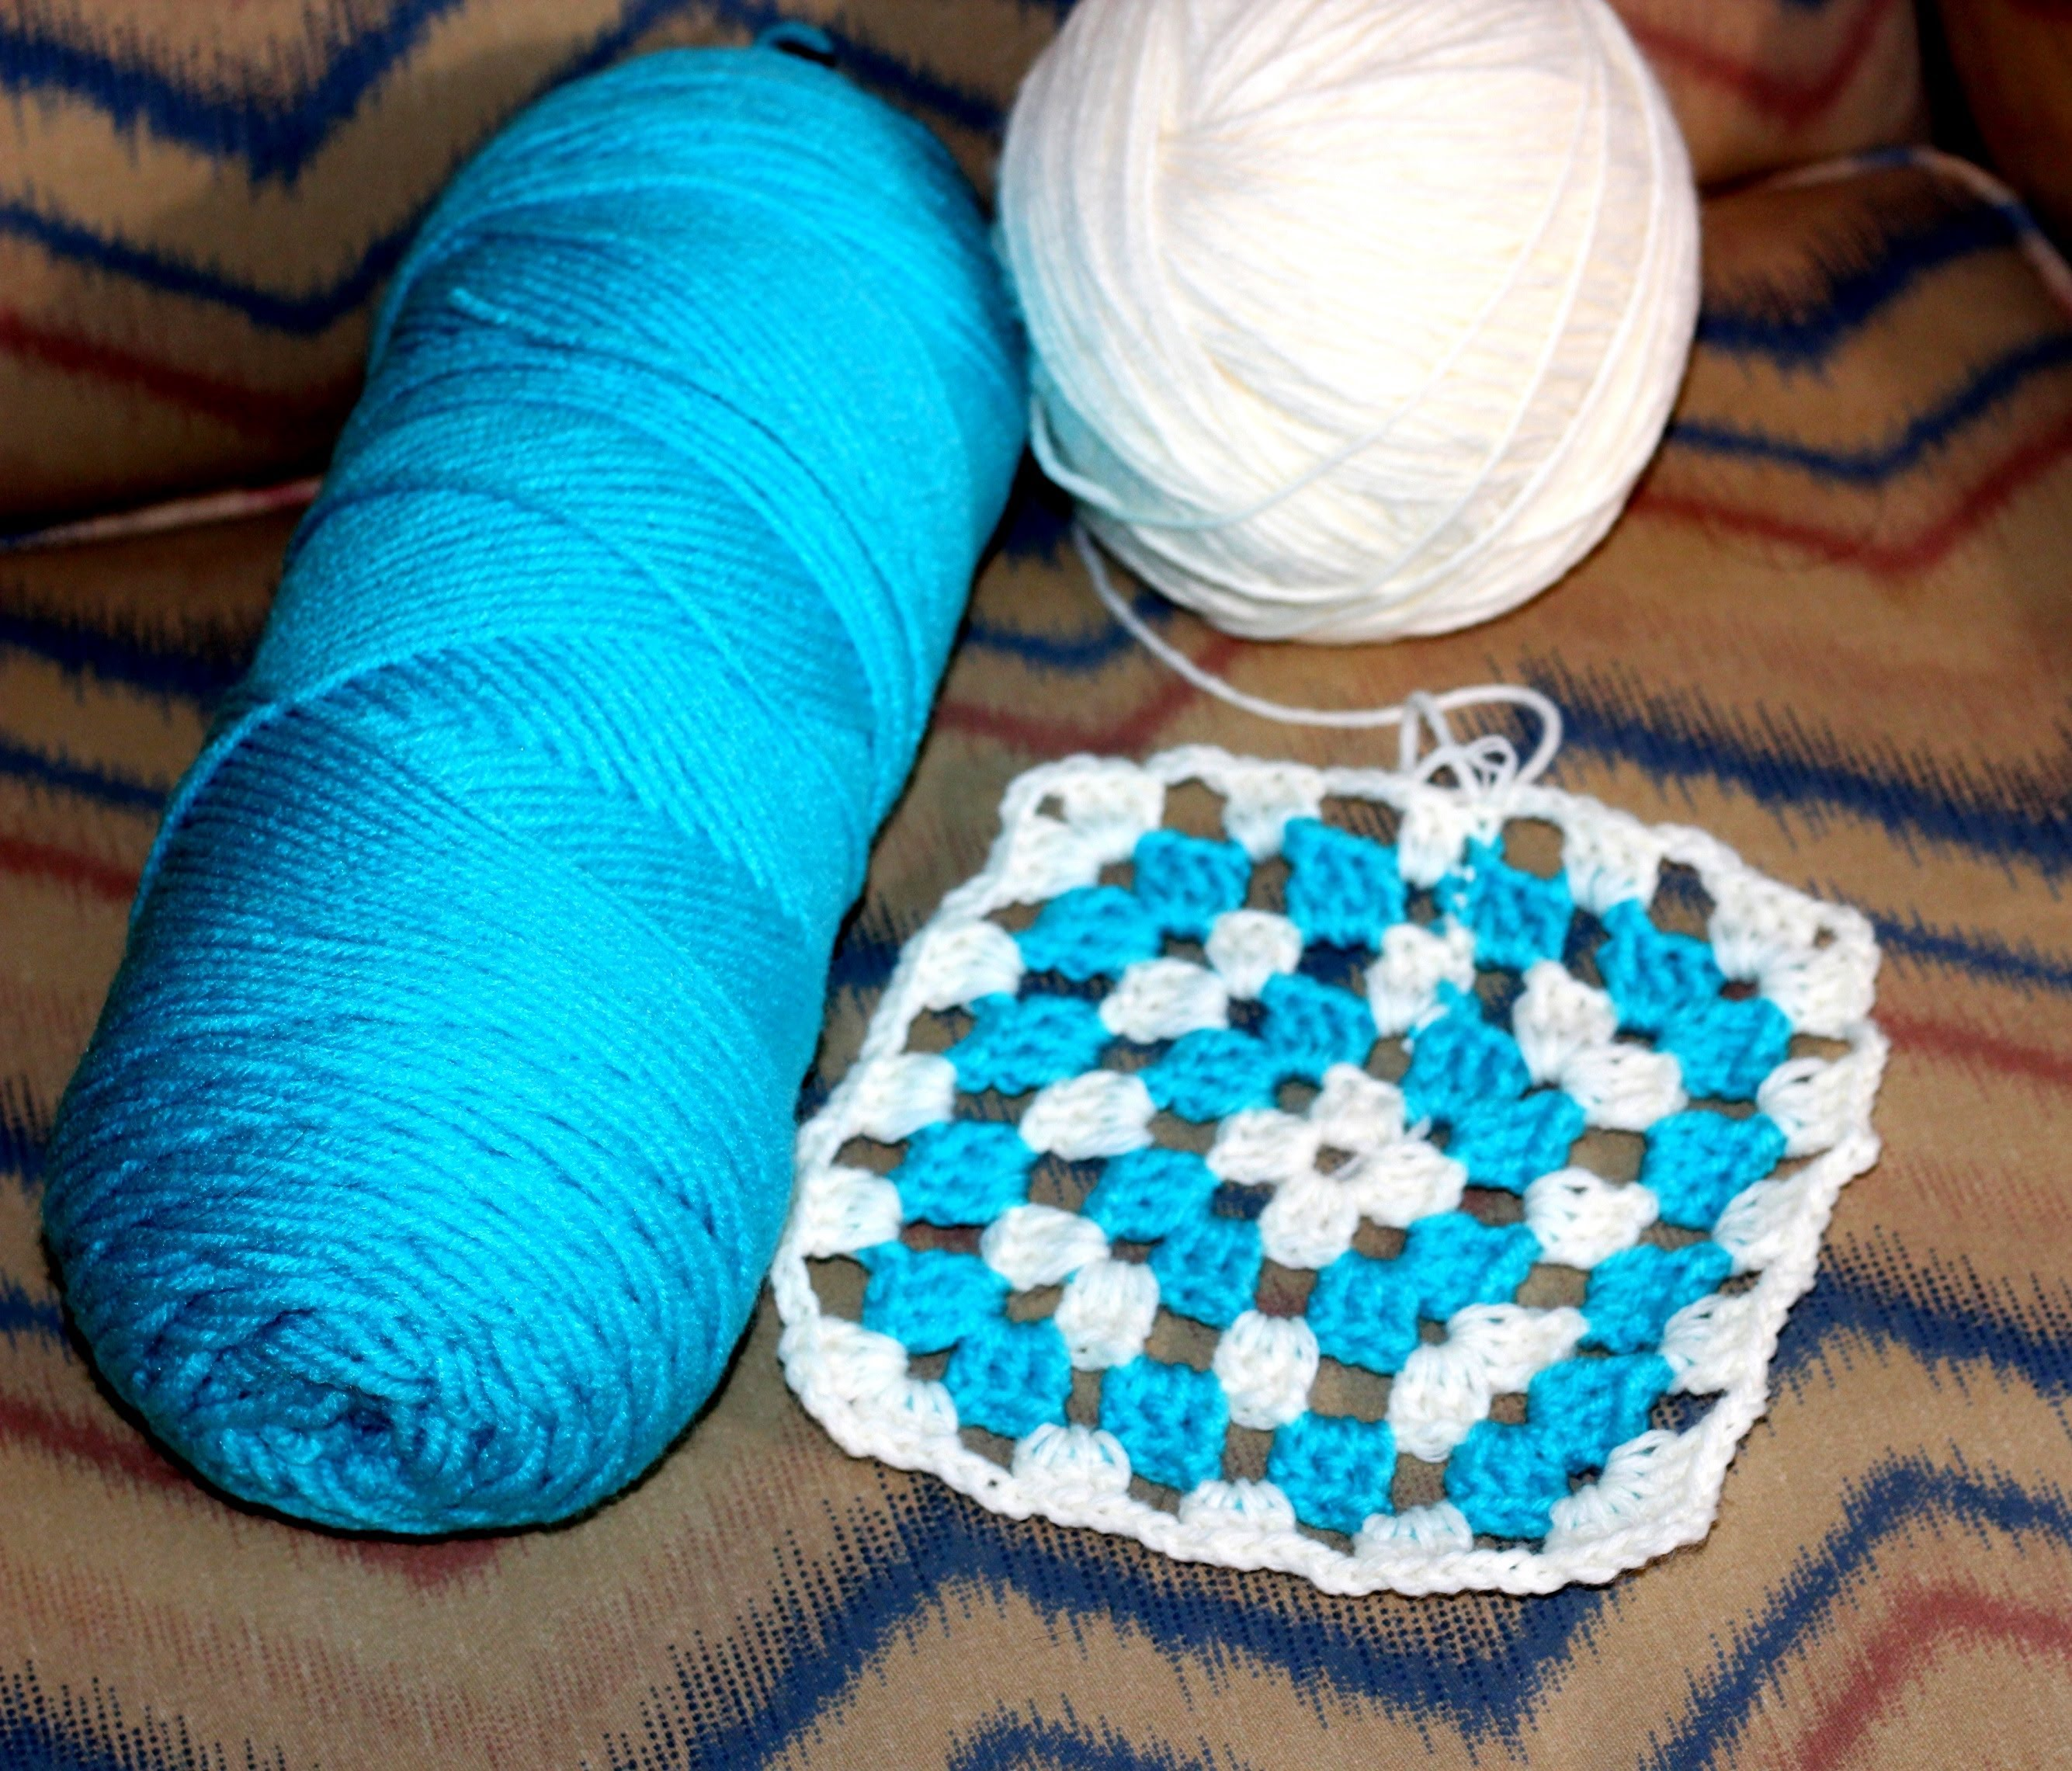 How To Crochet A Blanket how to crochet for beginners | easy afghan/throw/blanket - youtube tsaewdm